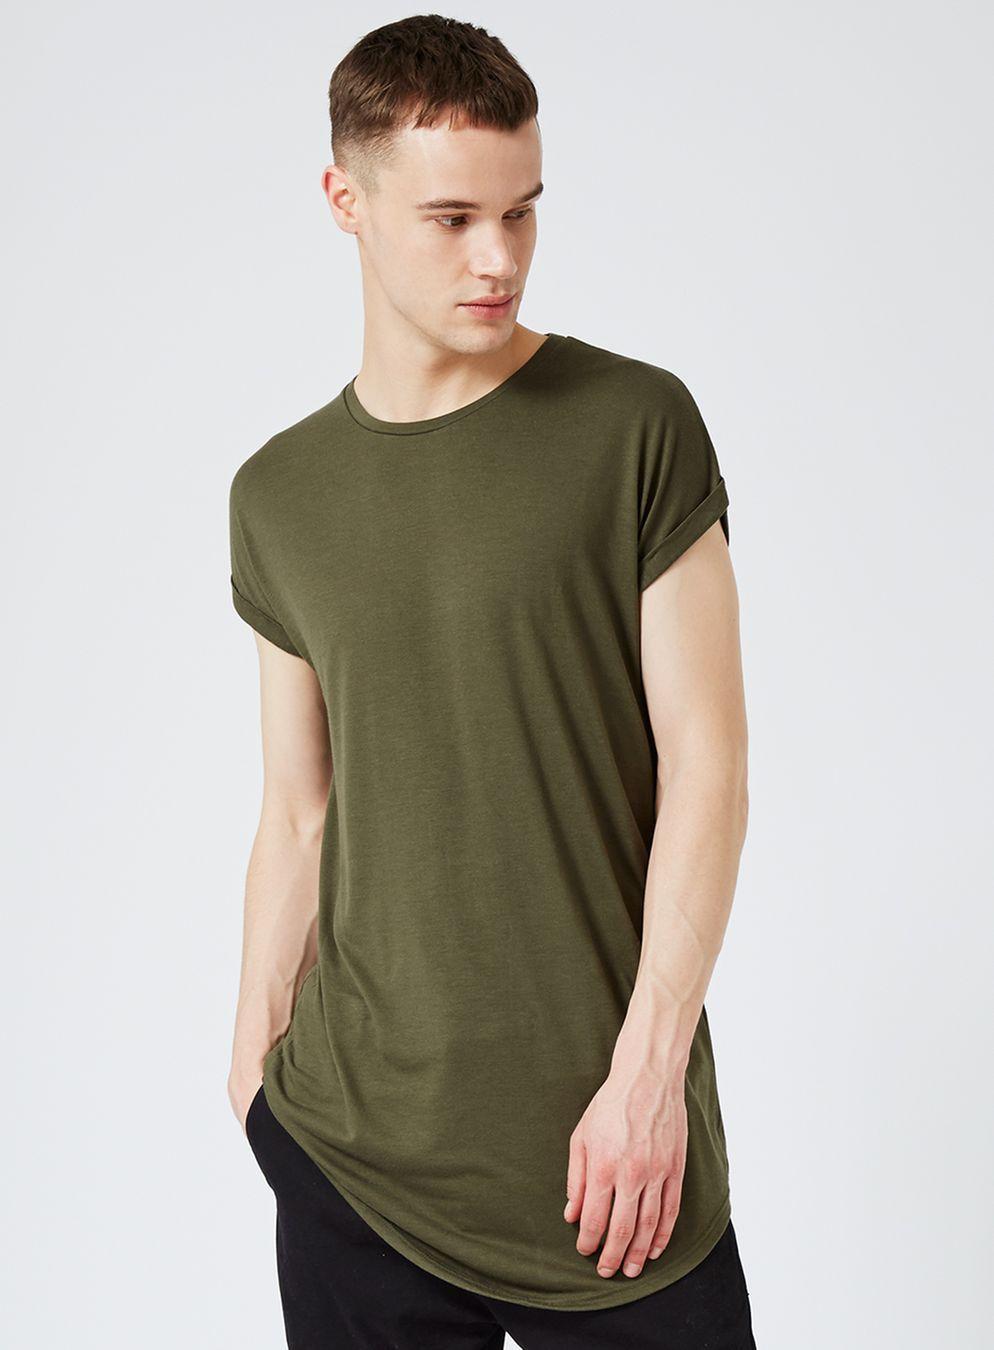 acd2fb22f Khaki Drop Shoulder Longline Fit T-Shirt | t-shirts | T shirt ...